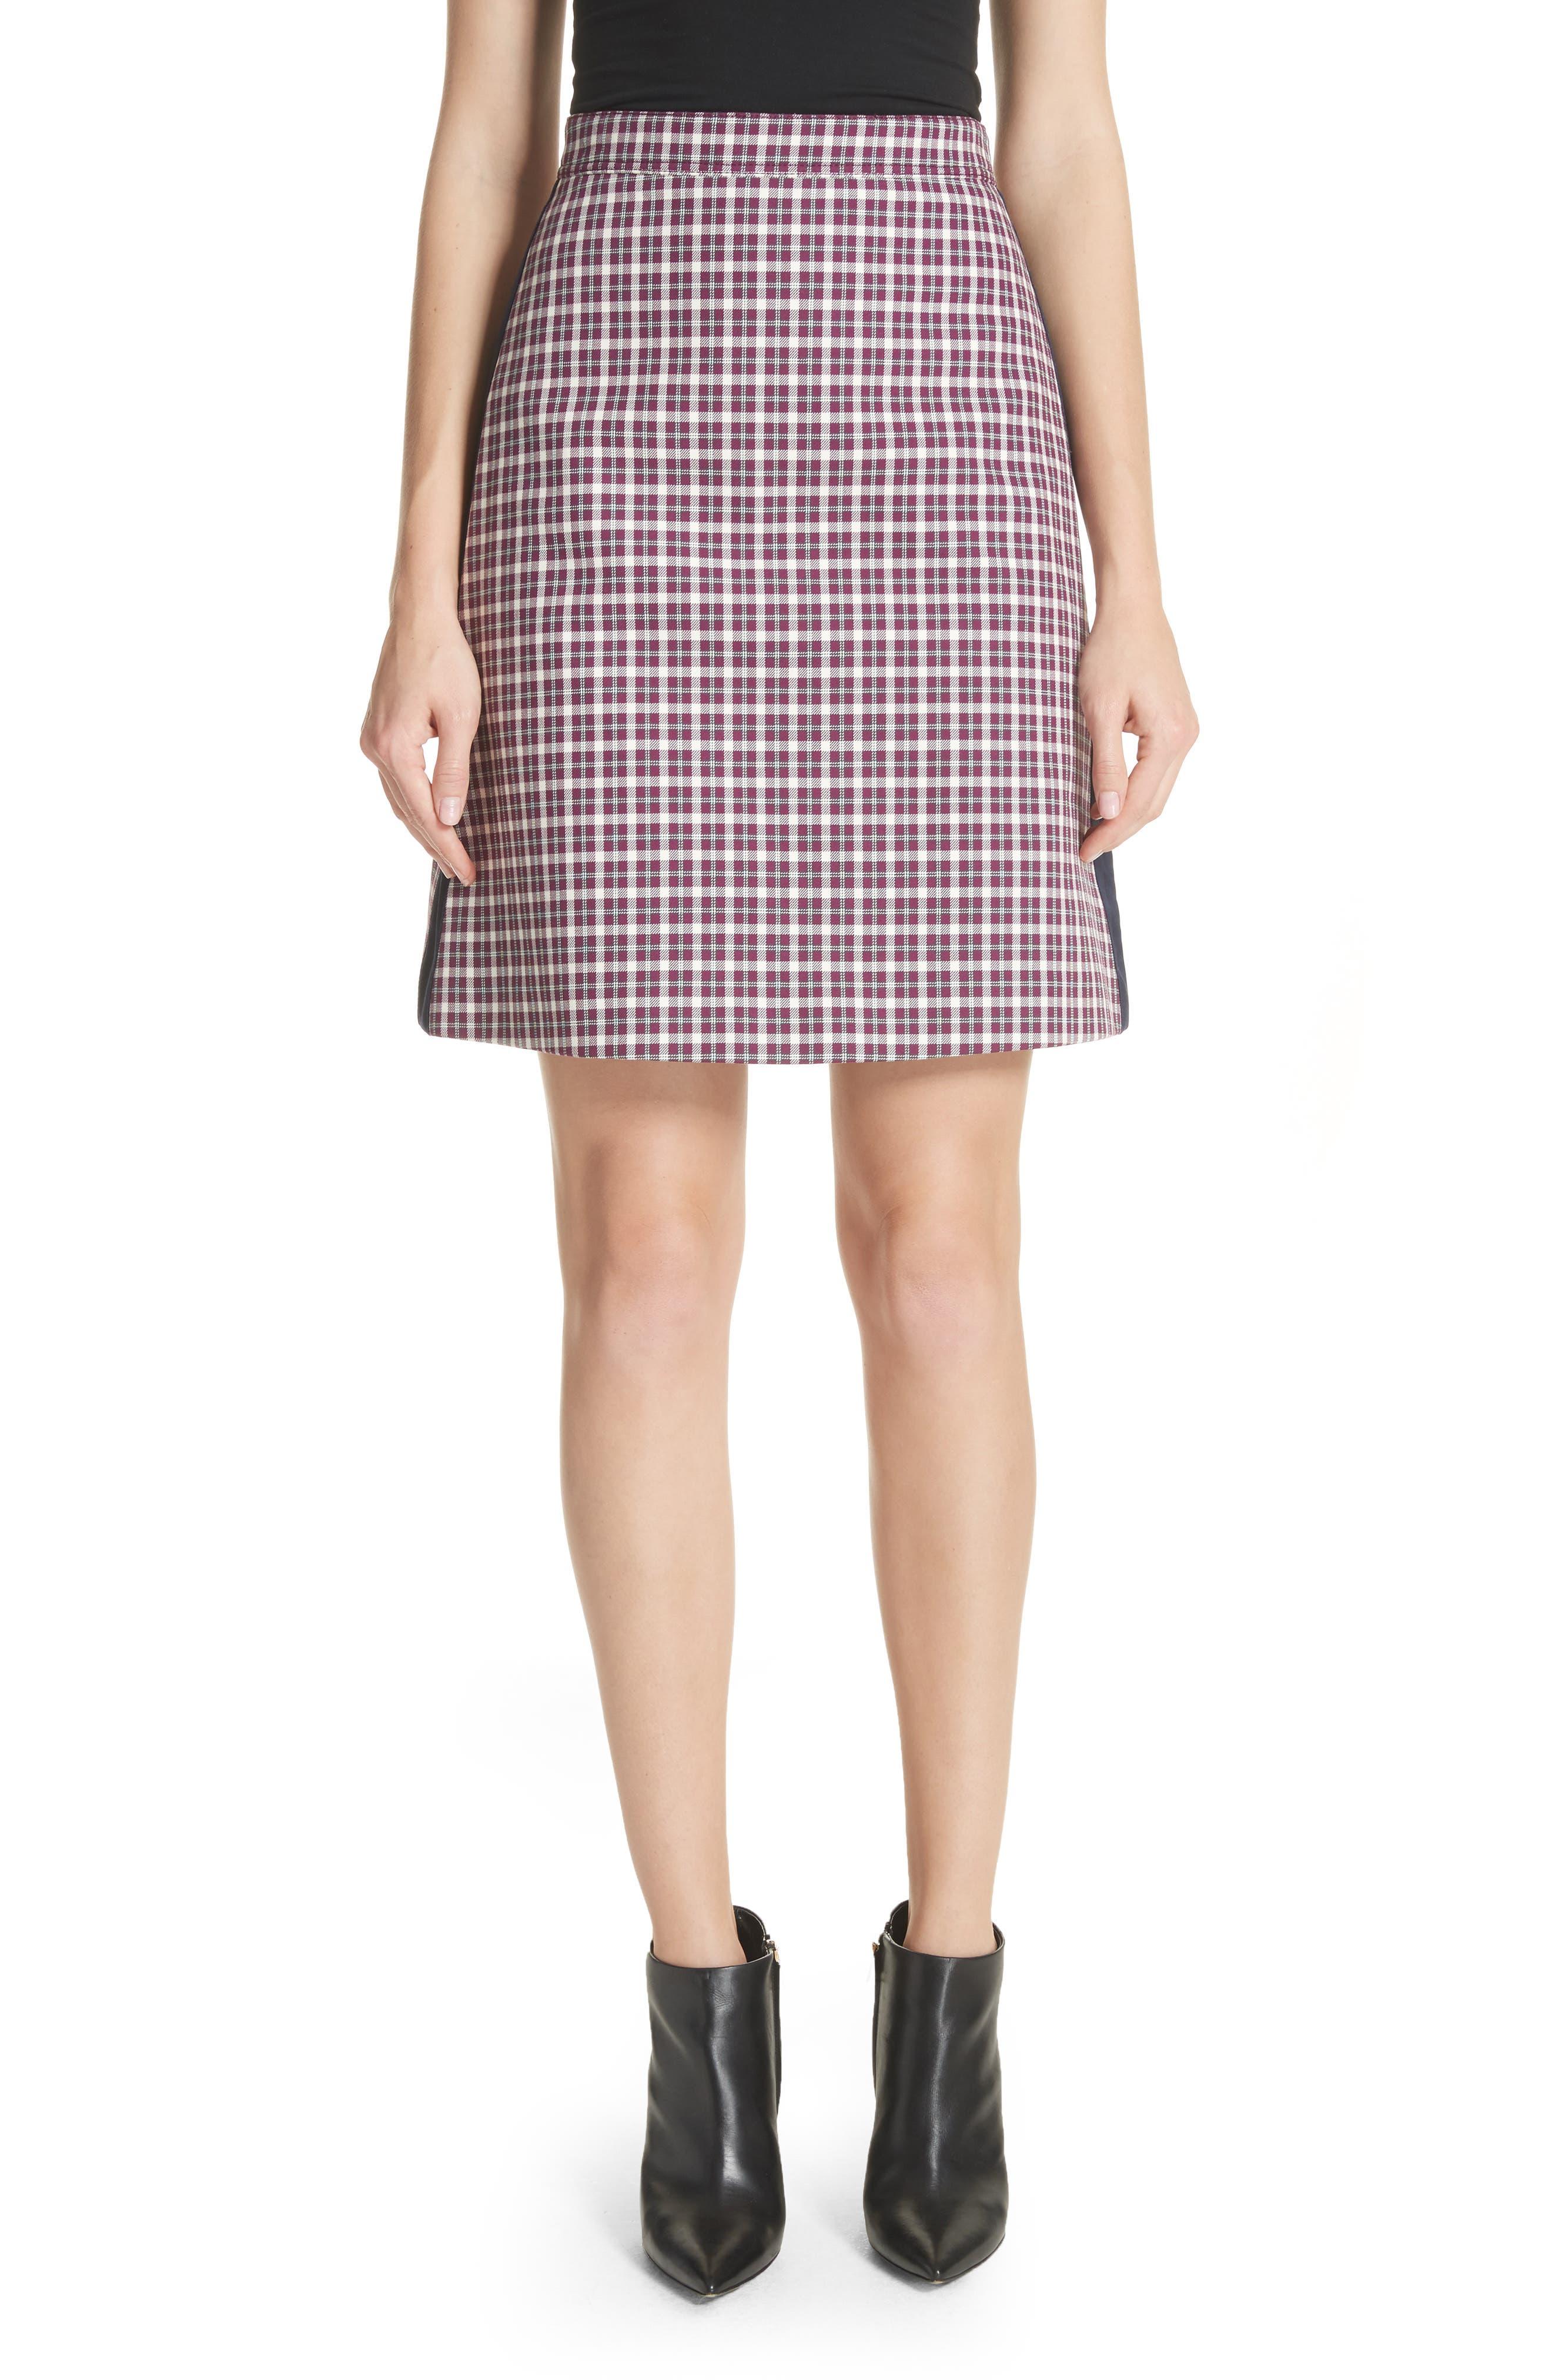 Stanforth Plaid A-Line Skirt,                             Main thumbnail 1, color,                             931